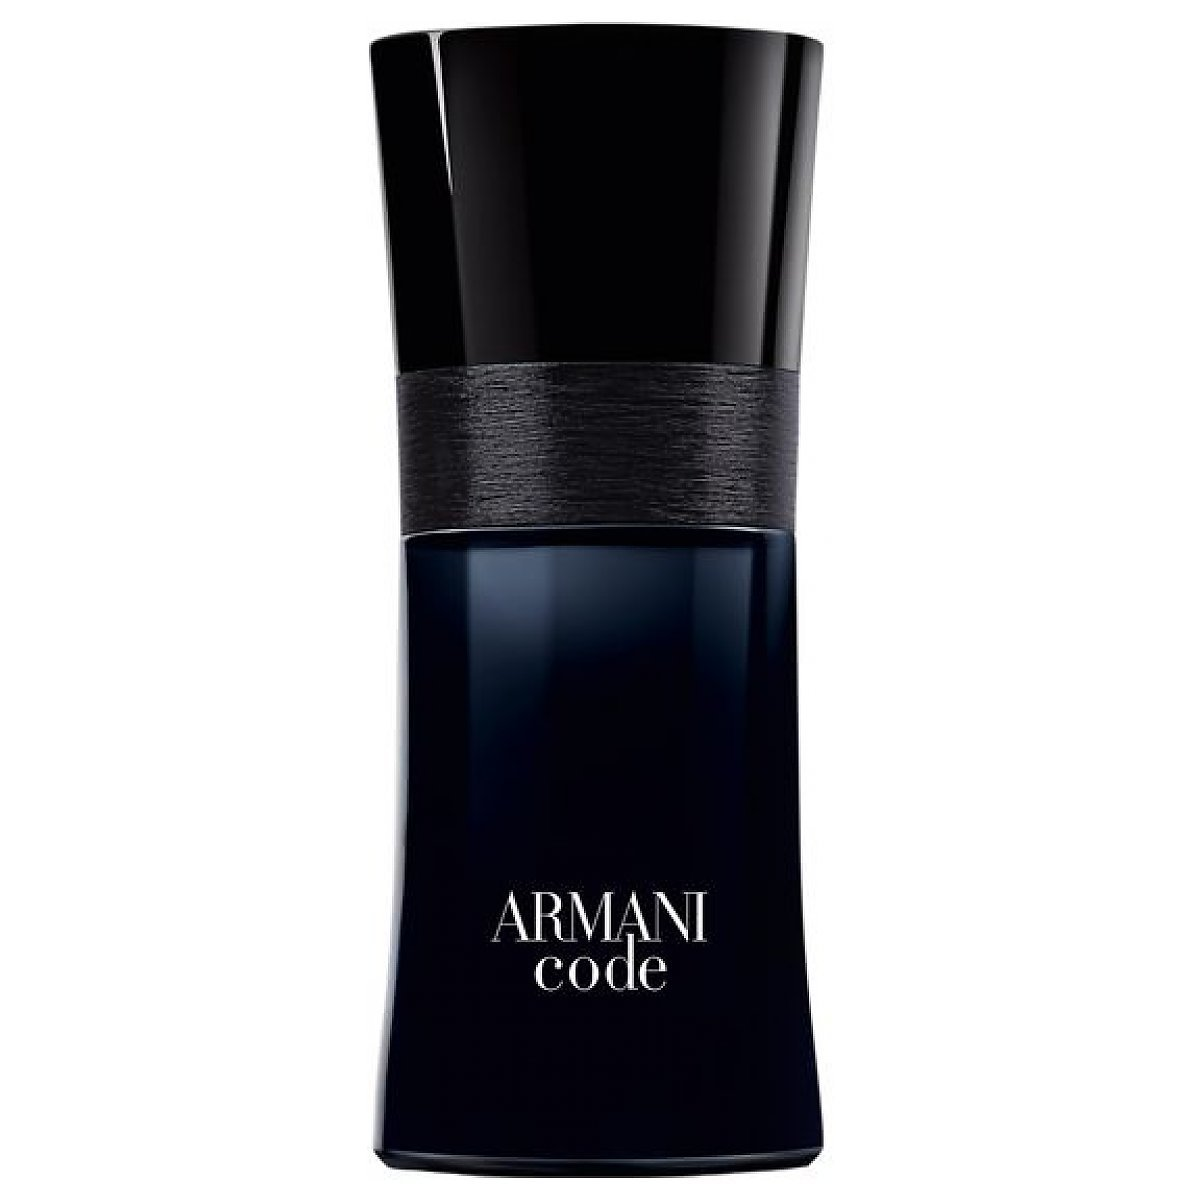 giorgio armani code pour homme woda toaletowa spray 30ml. Black Bedroom Furniture Sets. Home Design Ideas